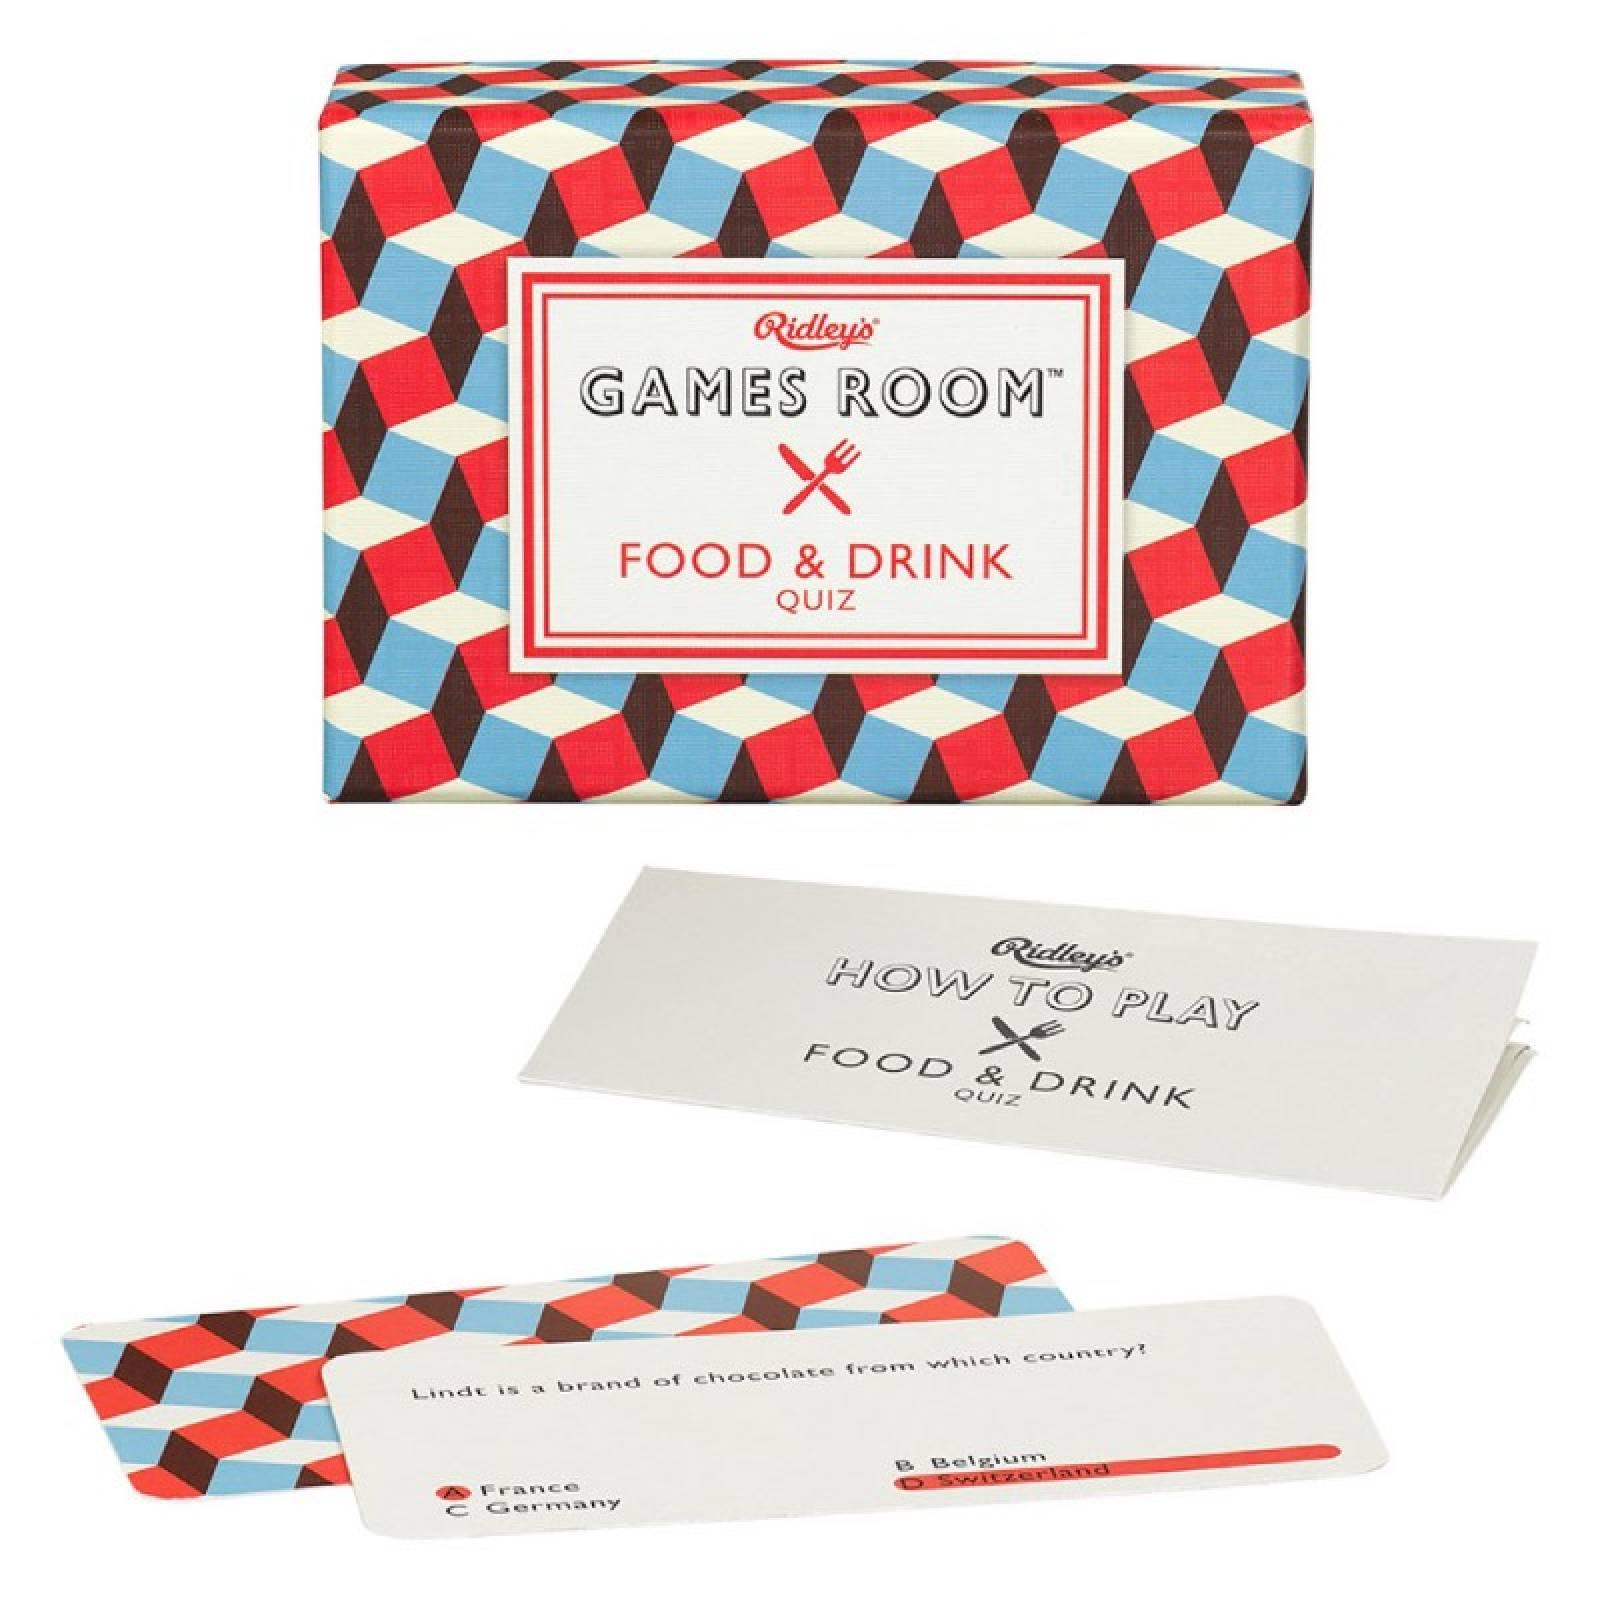 Food & Drink Quiz Game In Retro Box